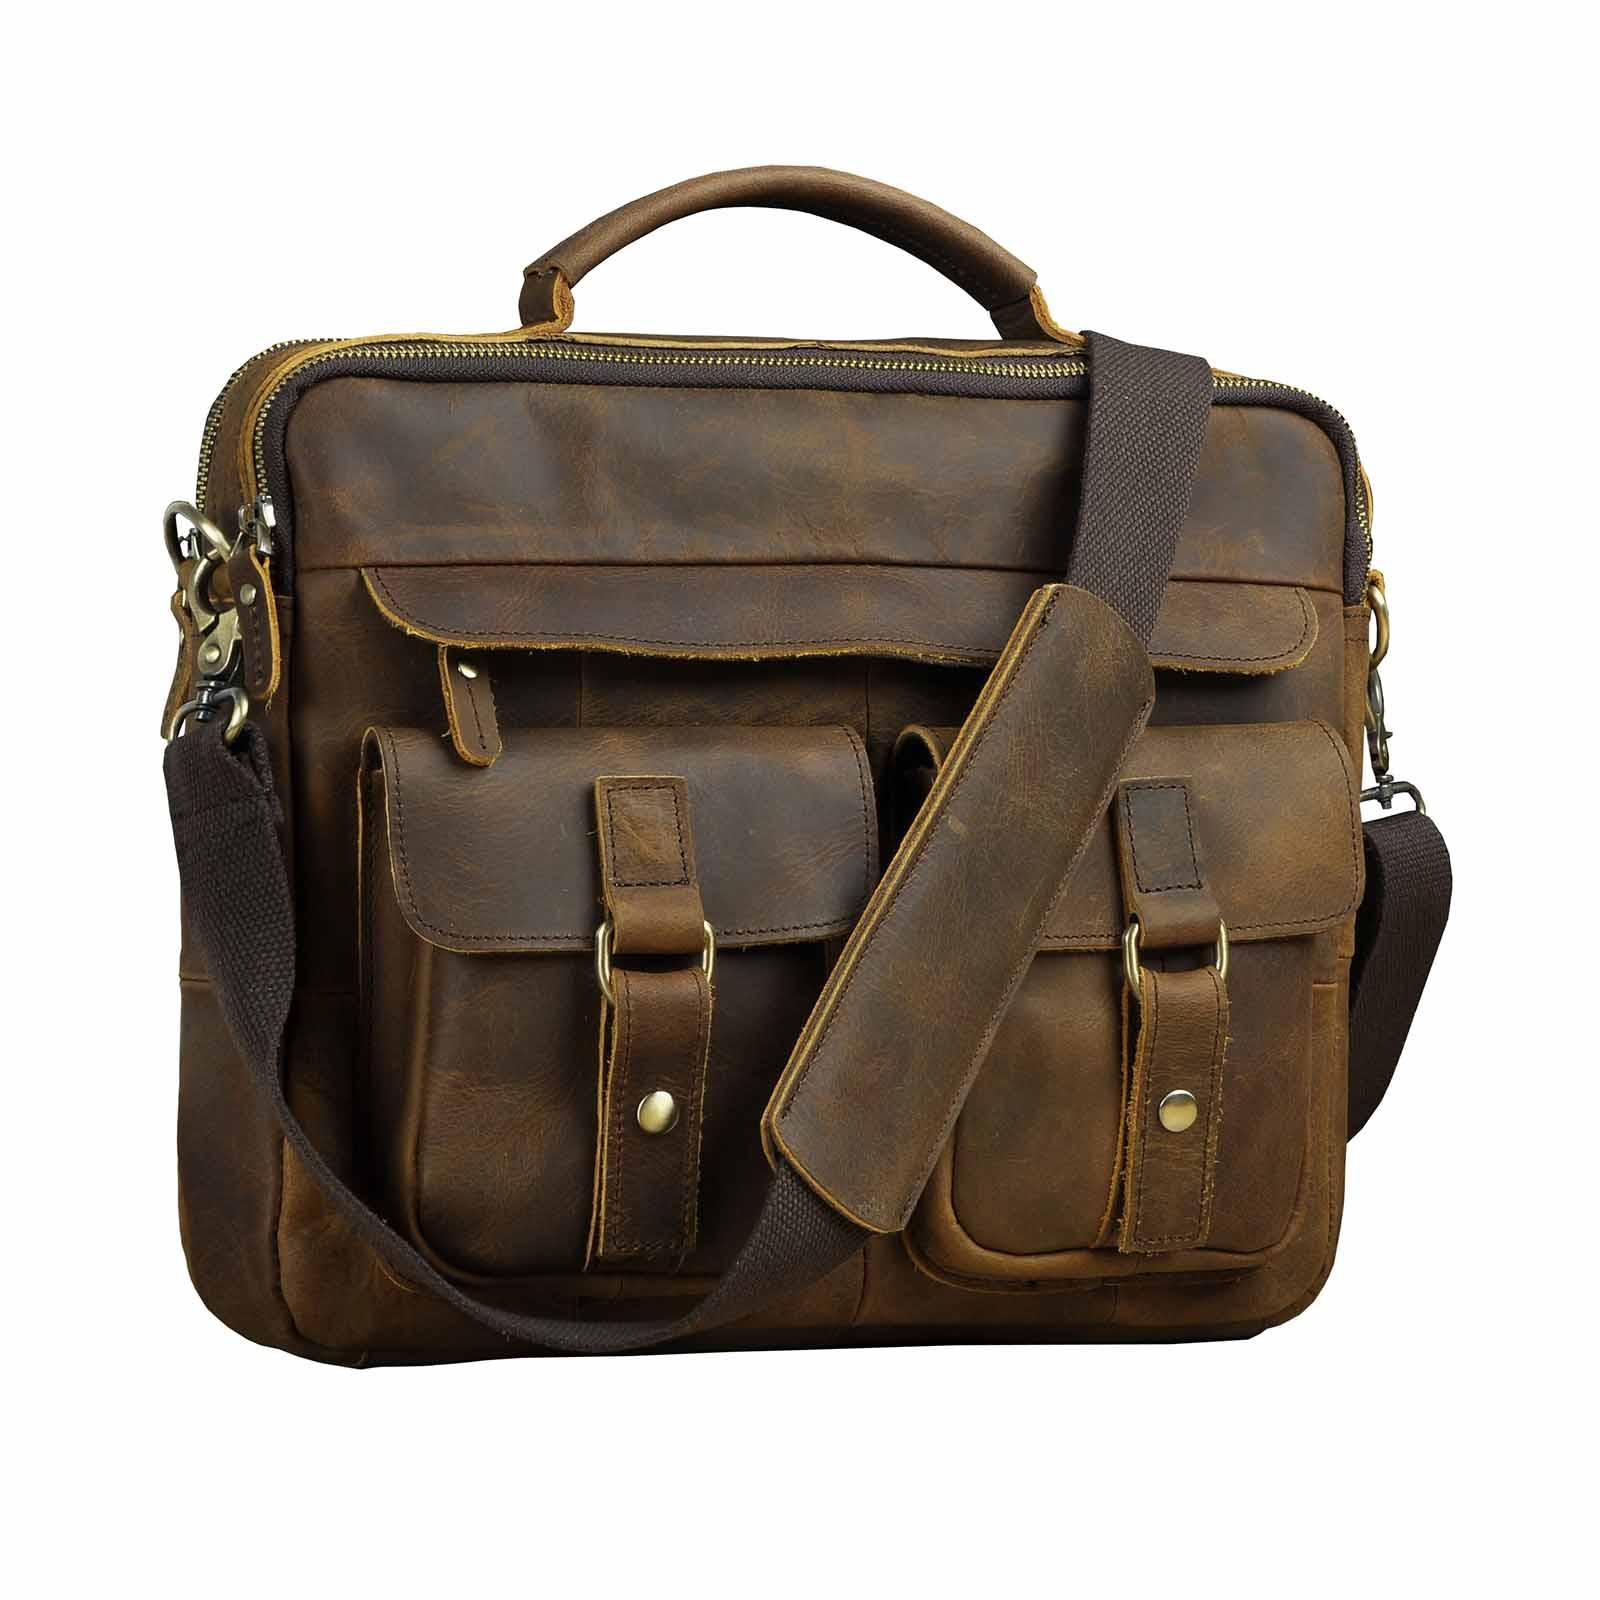 Travel Shoulder Bags Laptop Bag Men Leather Genuine Briefcase Computer Bags For Men Messenger Bag Purse 2019 New Fashion